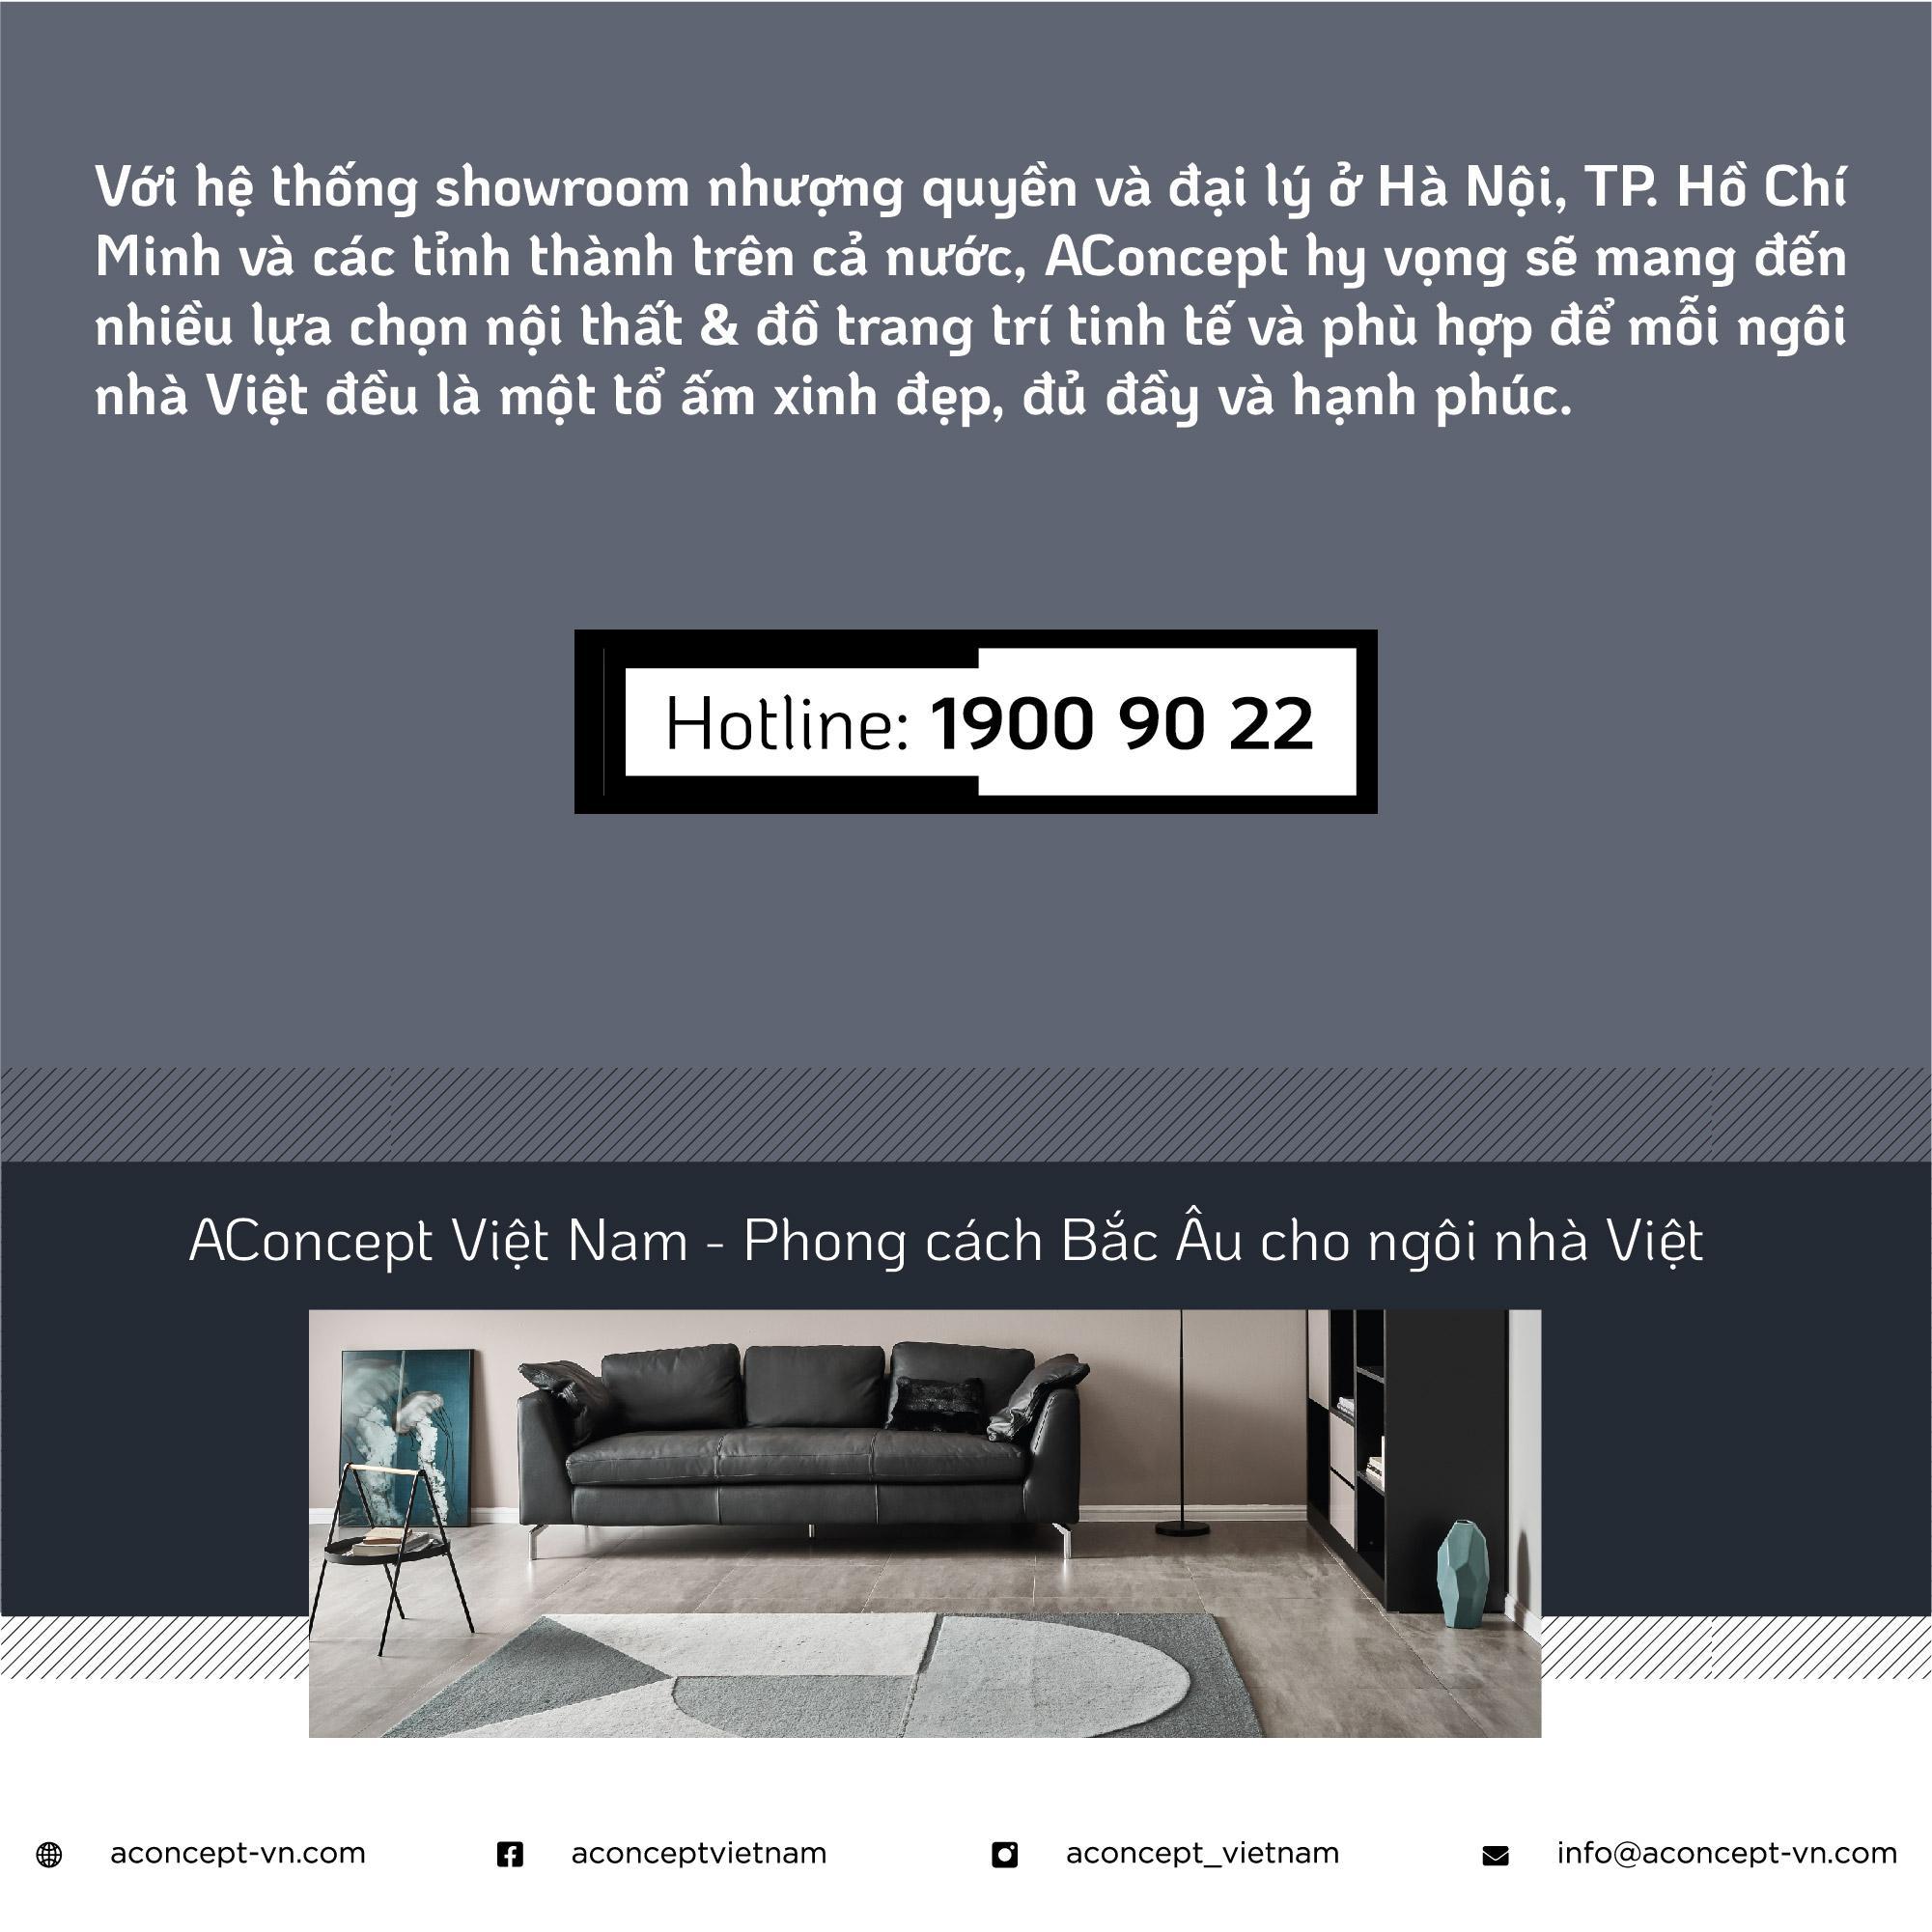 EDM-500x320-Re covered-21.jpg